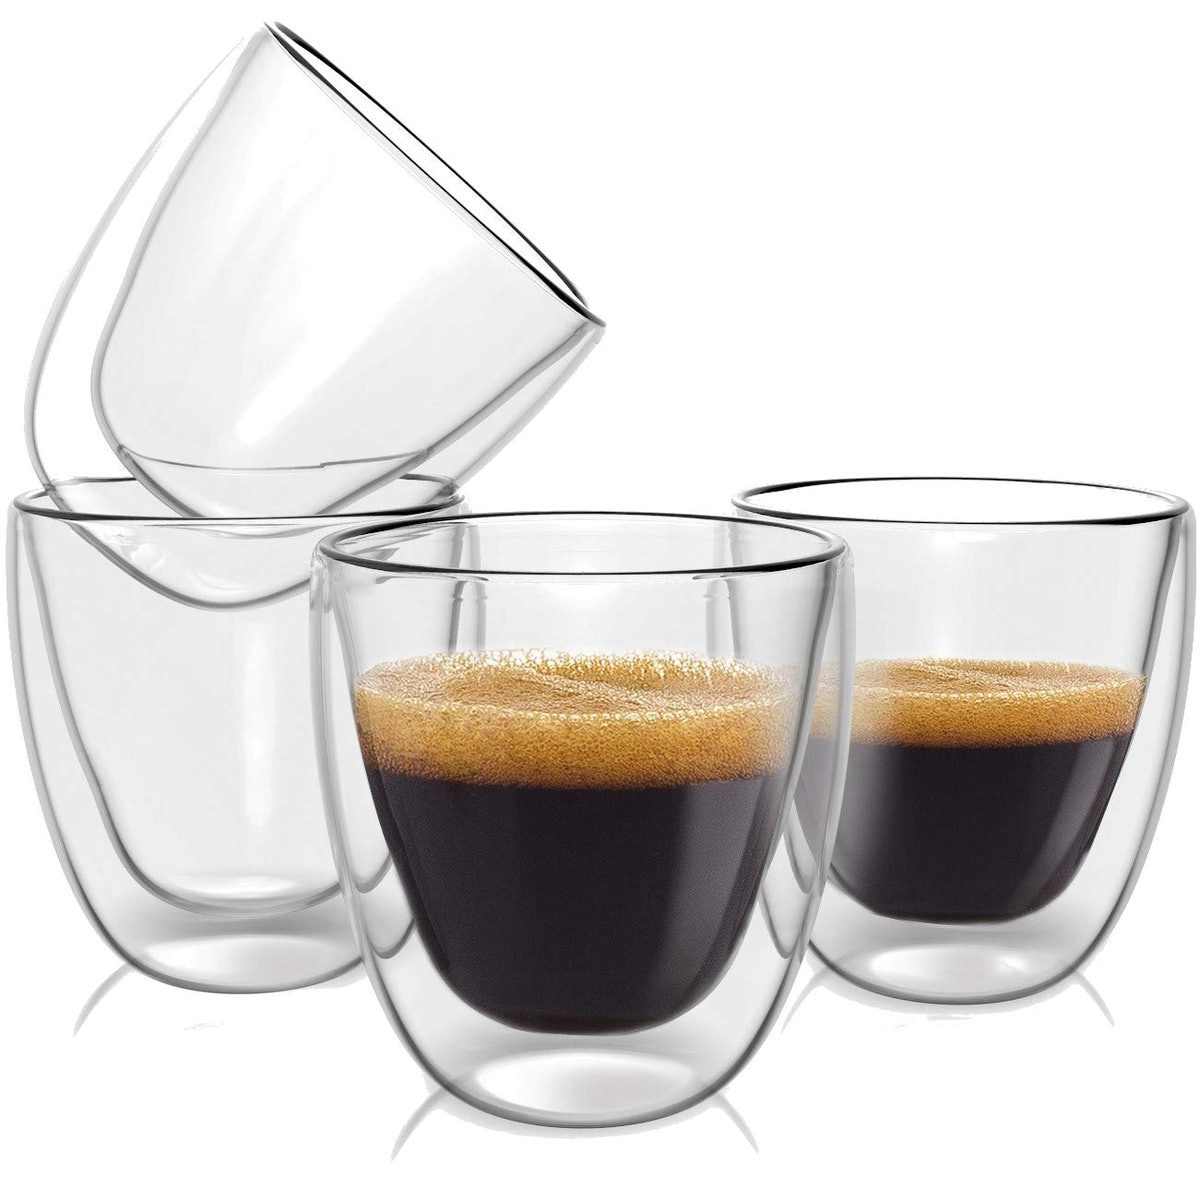 Evaryl Double Wall Espresso Cups Set (Set of 4)